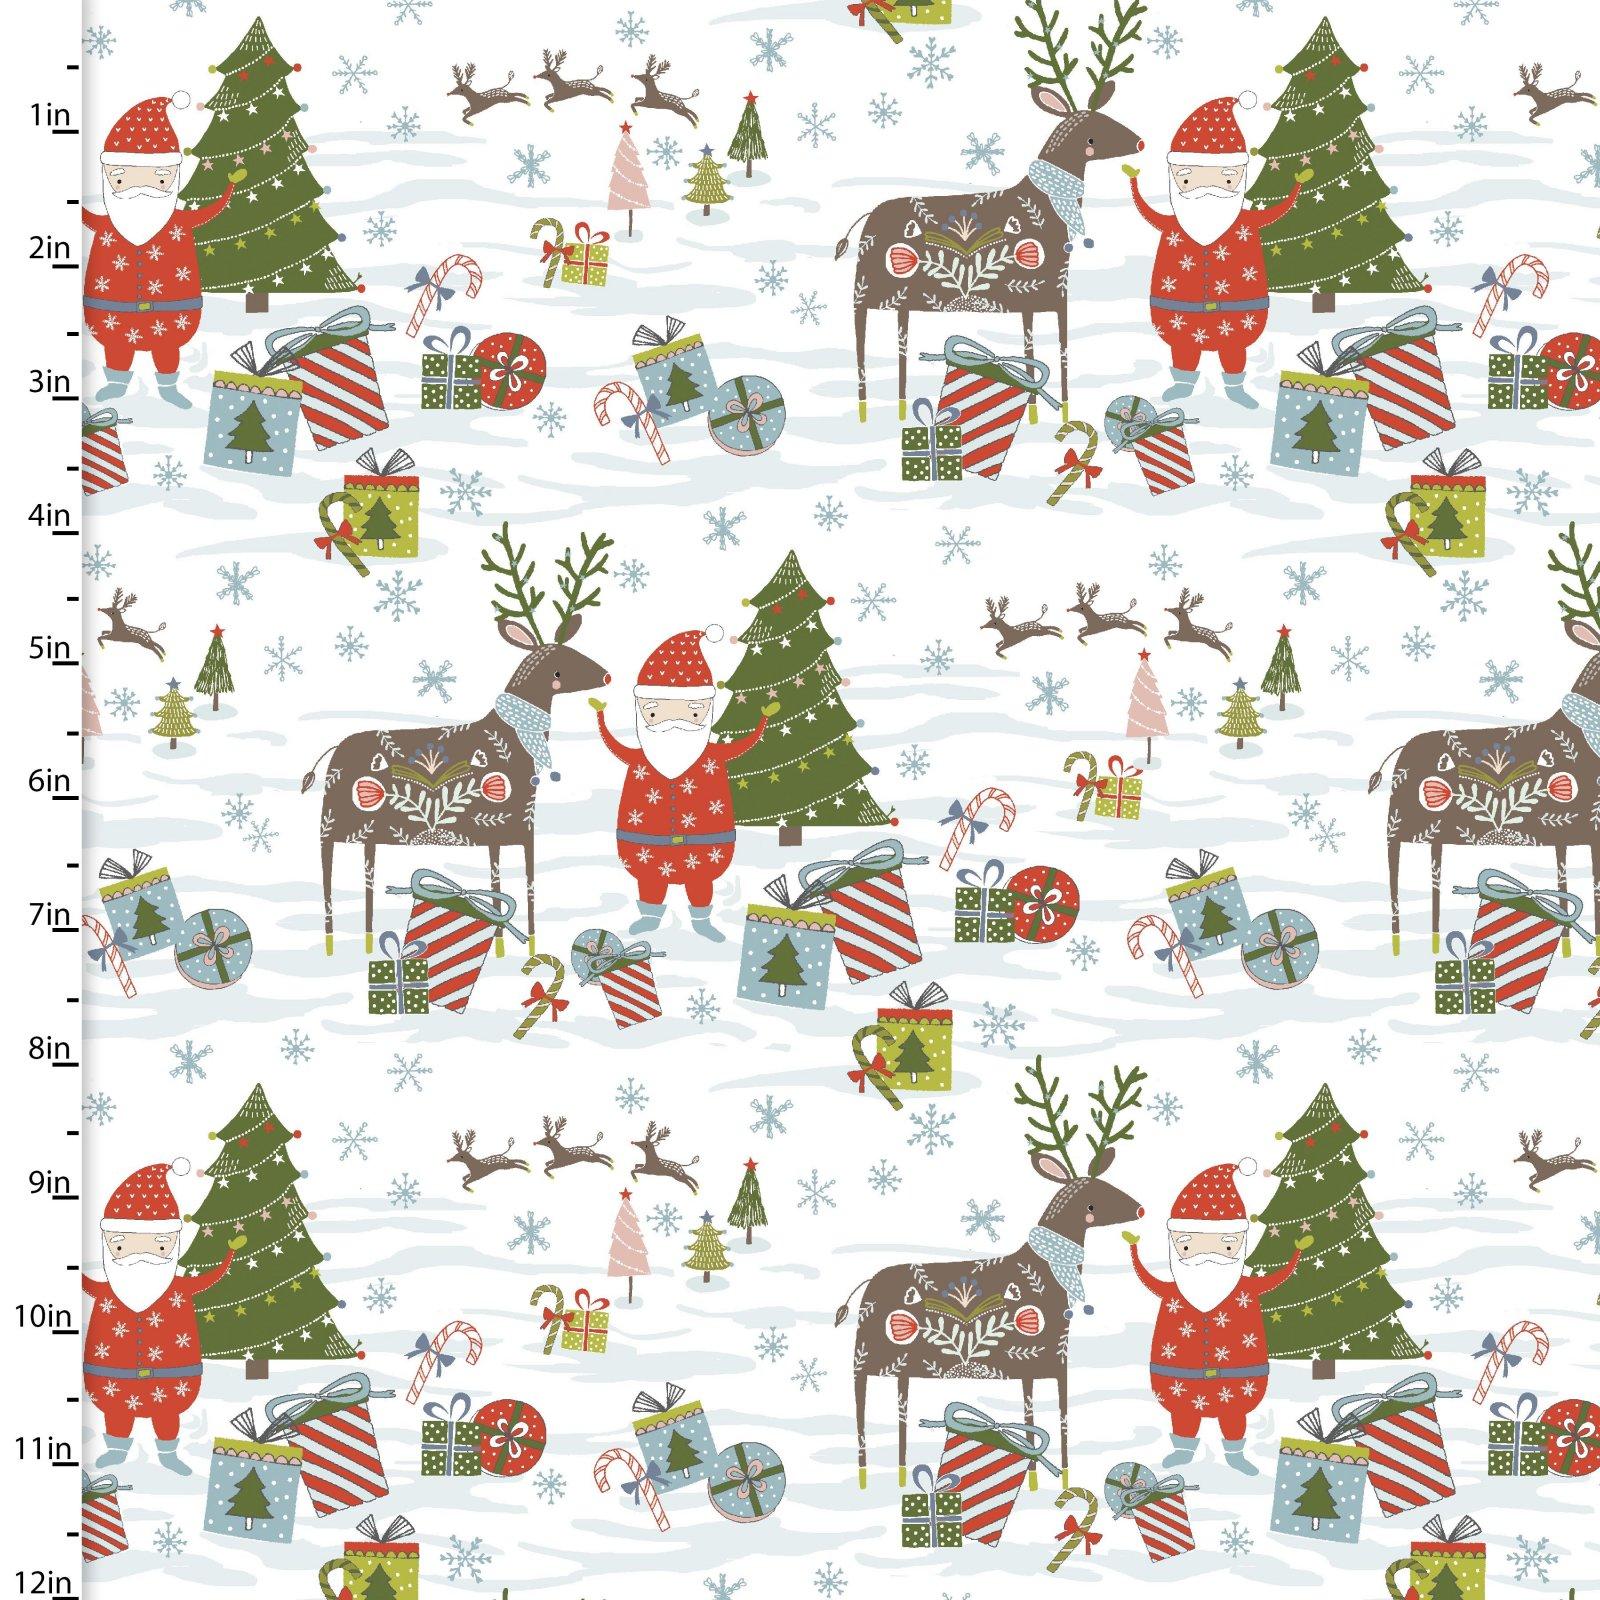 Happy Holidays by Flora Waycott<br>13839-White